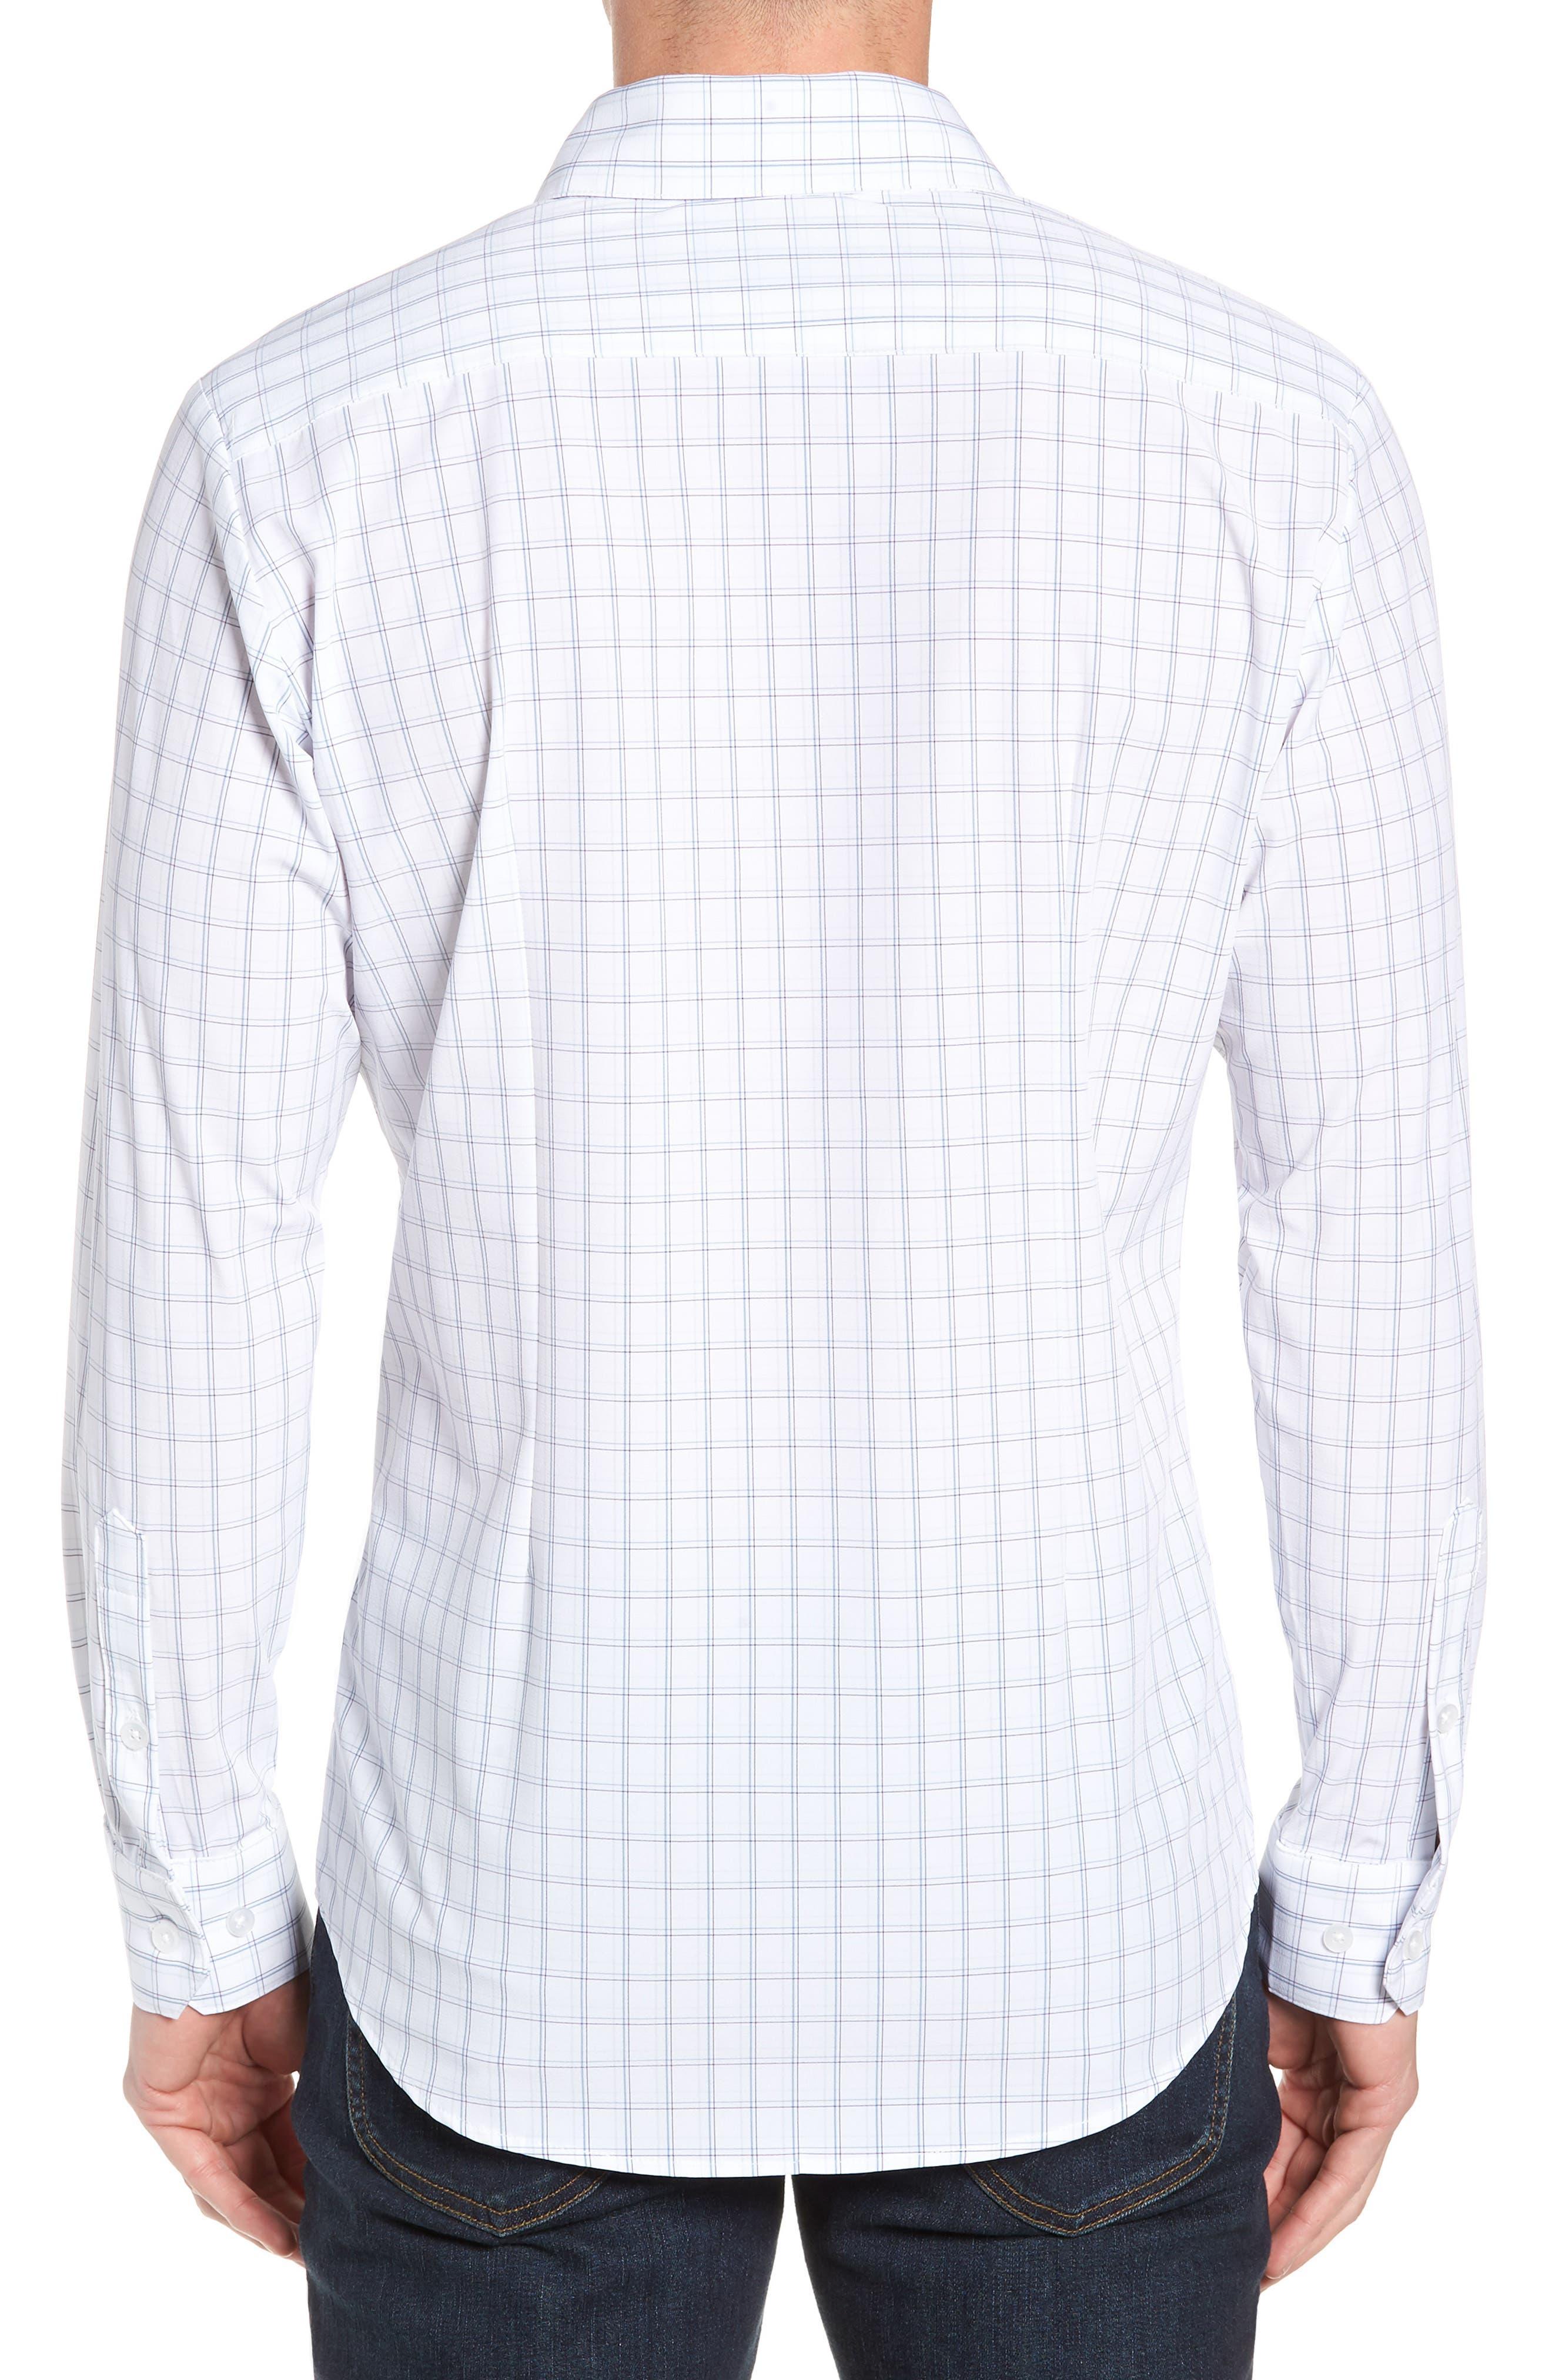 Sanders Slim Fit Check Performance Sport Shirt,                             Alternate thumbnail 3, color,                             WHITE